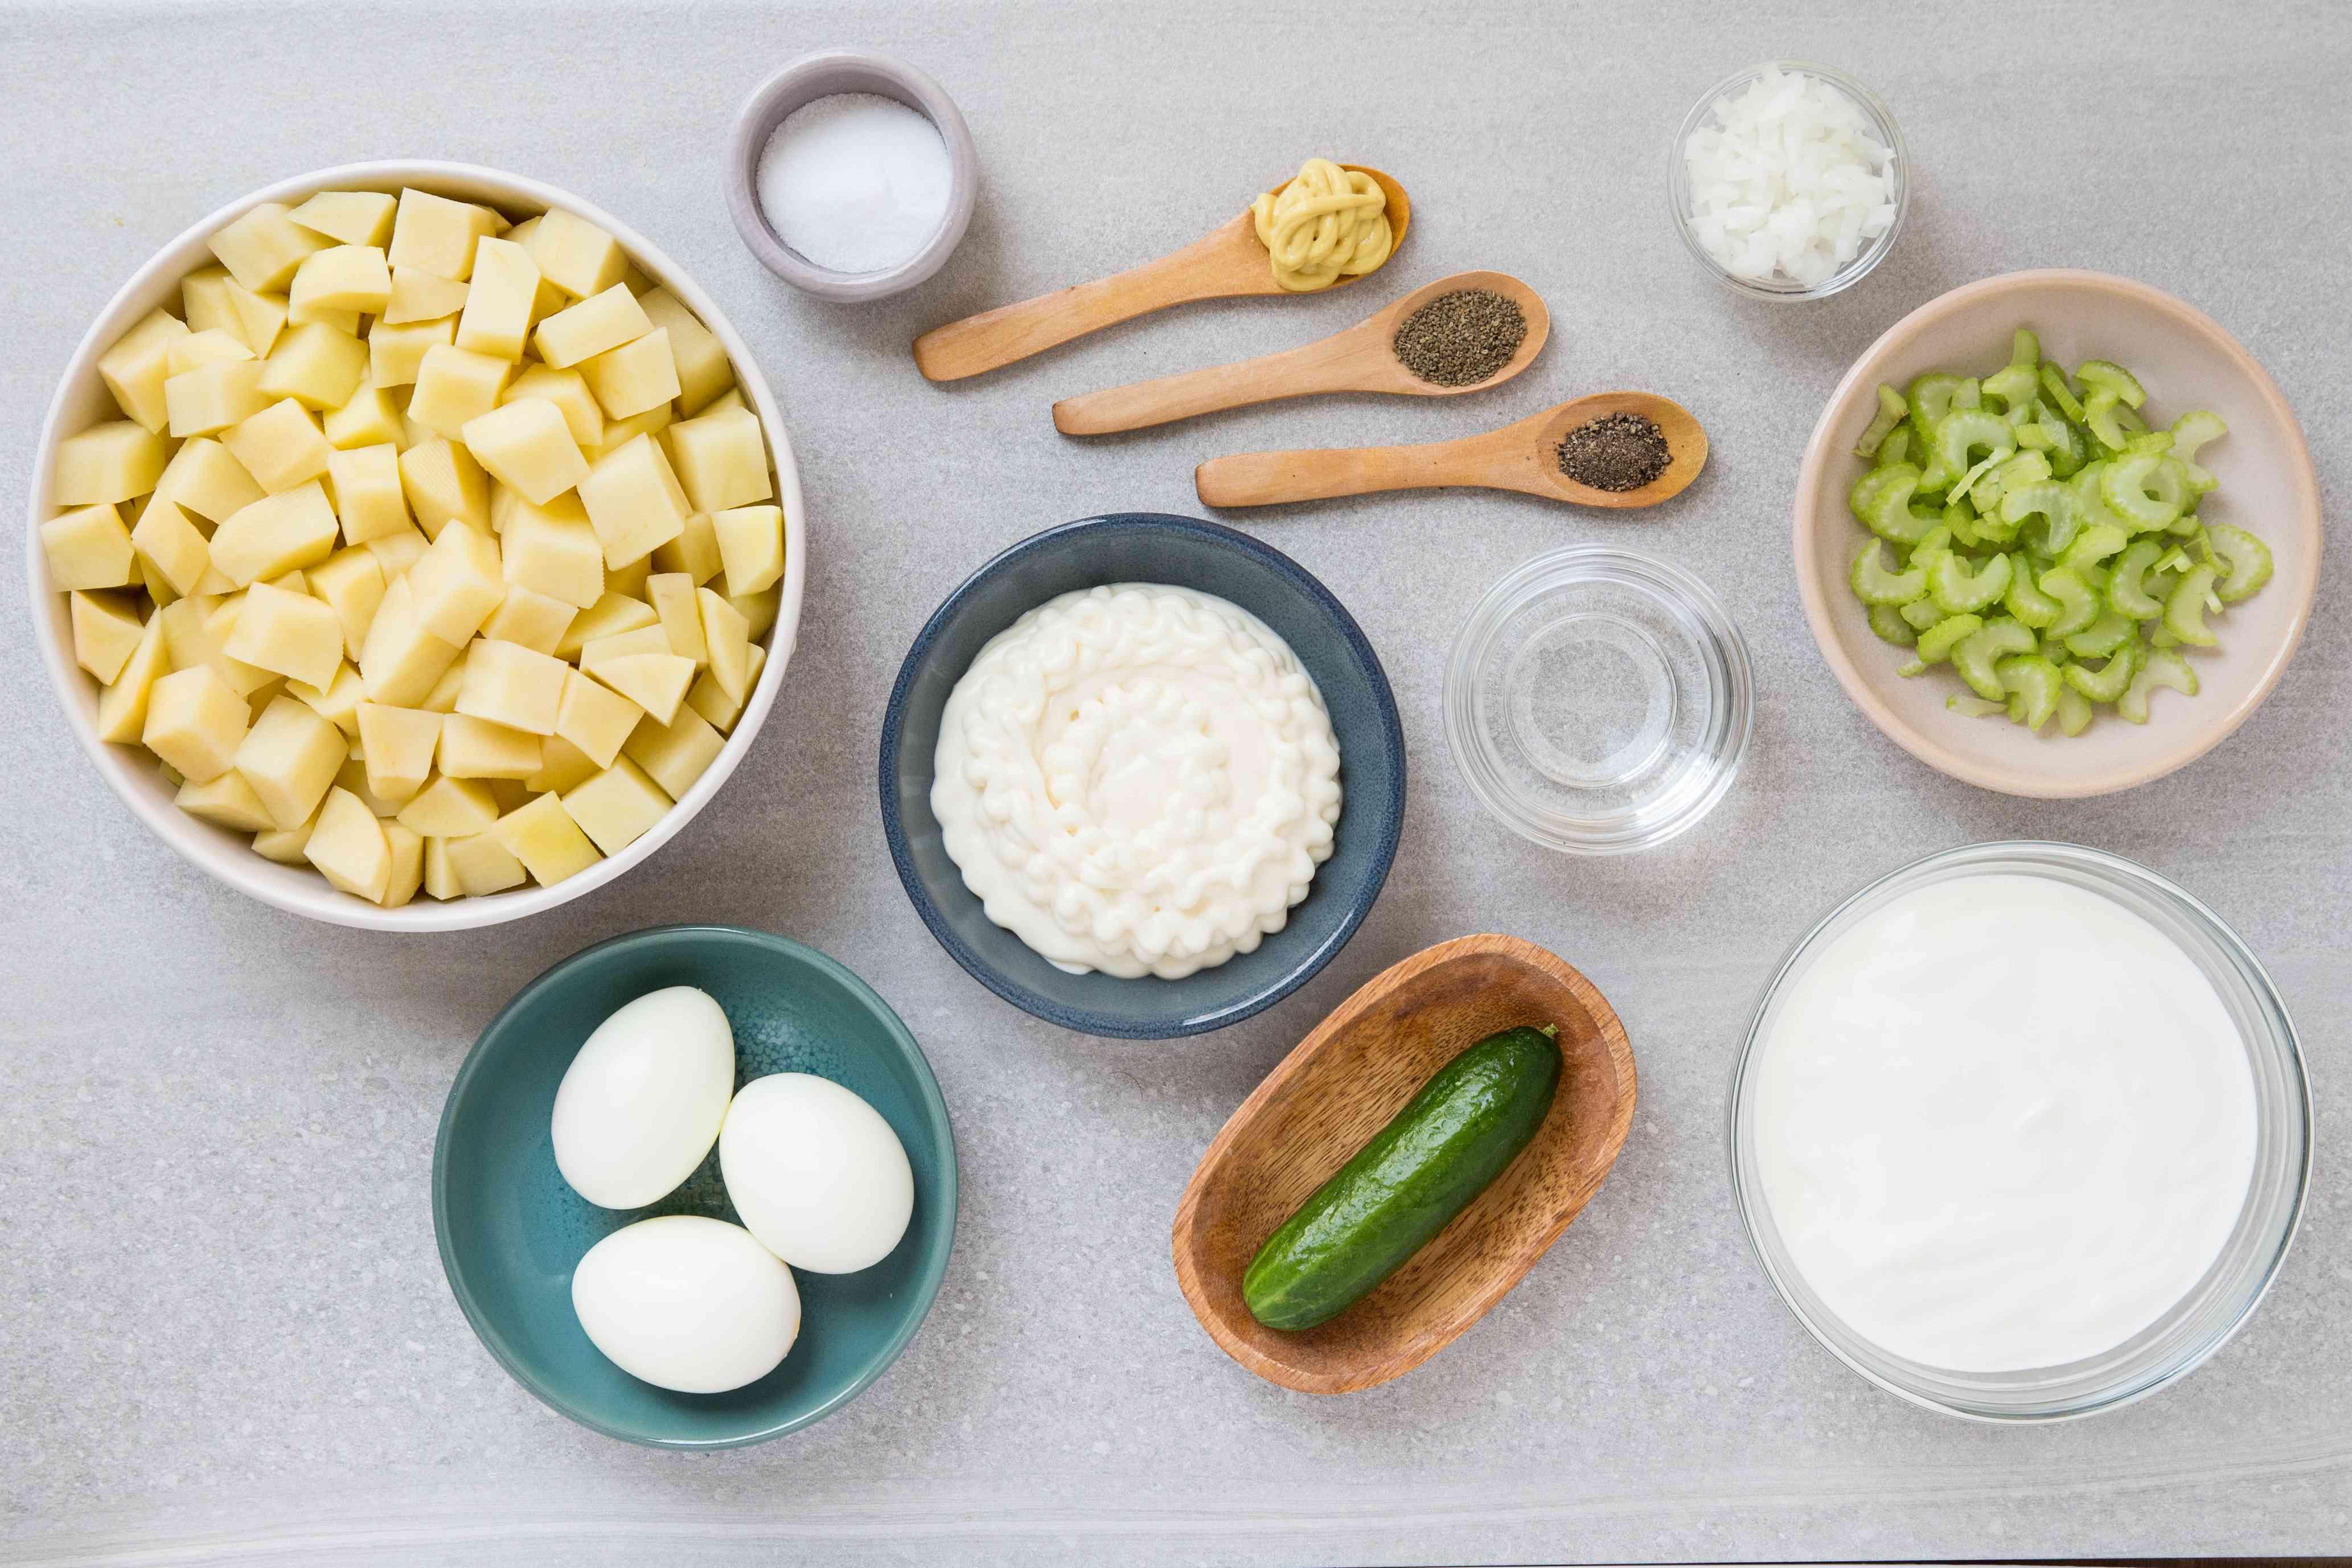 Sour Cream Potato and Egg Salad Recipe ingredients